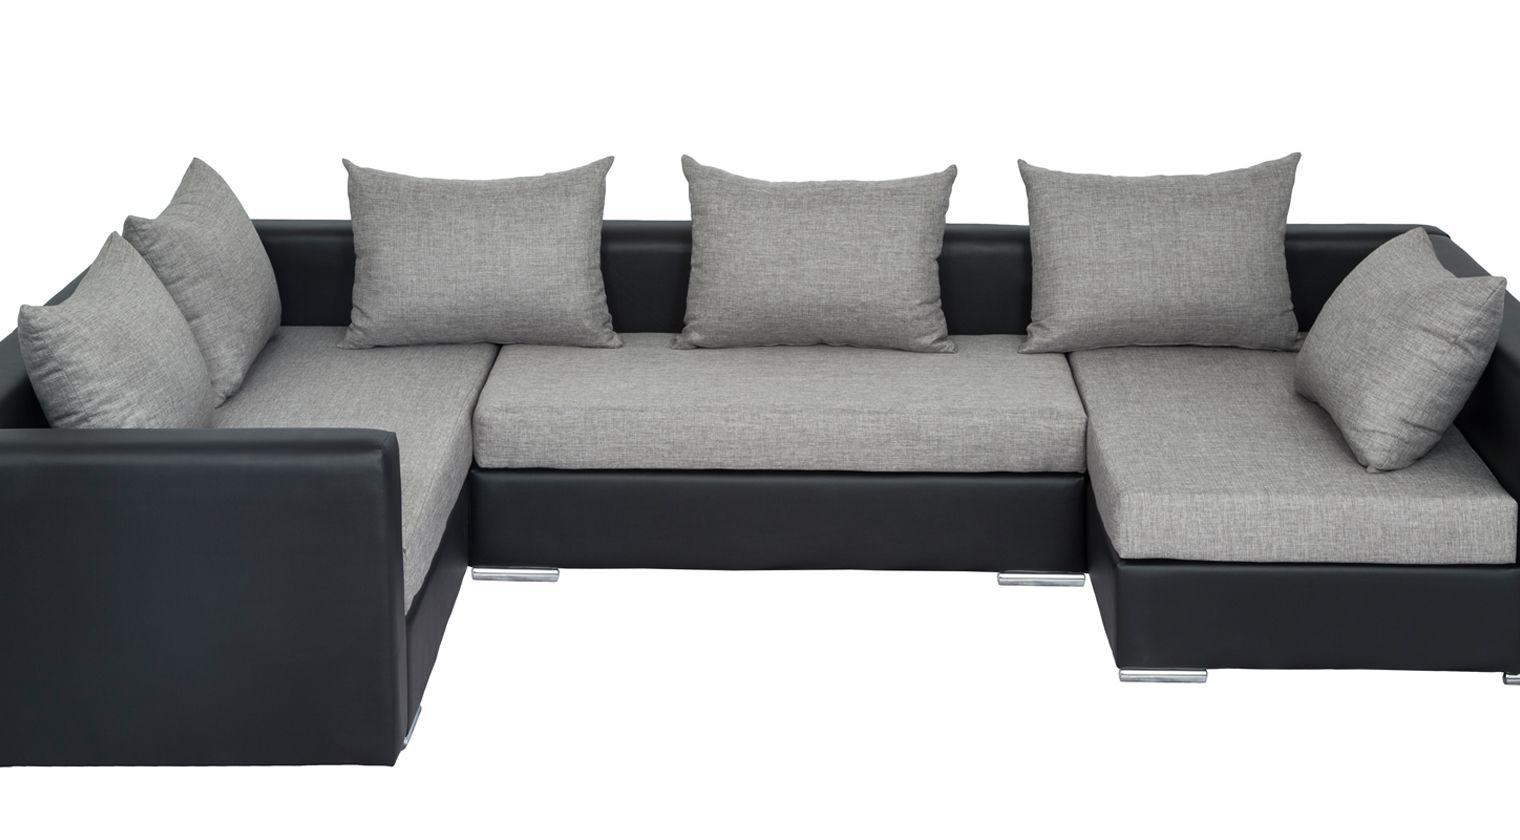 Sof rinconera sevilla sofas rinconera for Sofas baratos sevilla